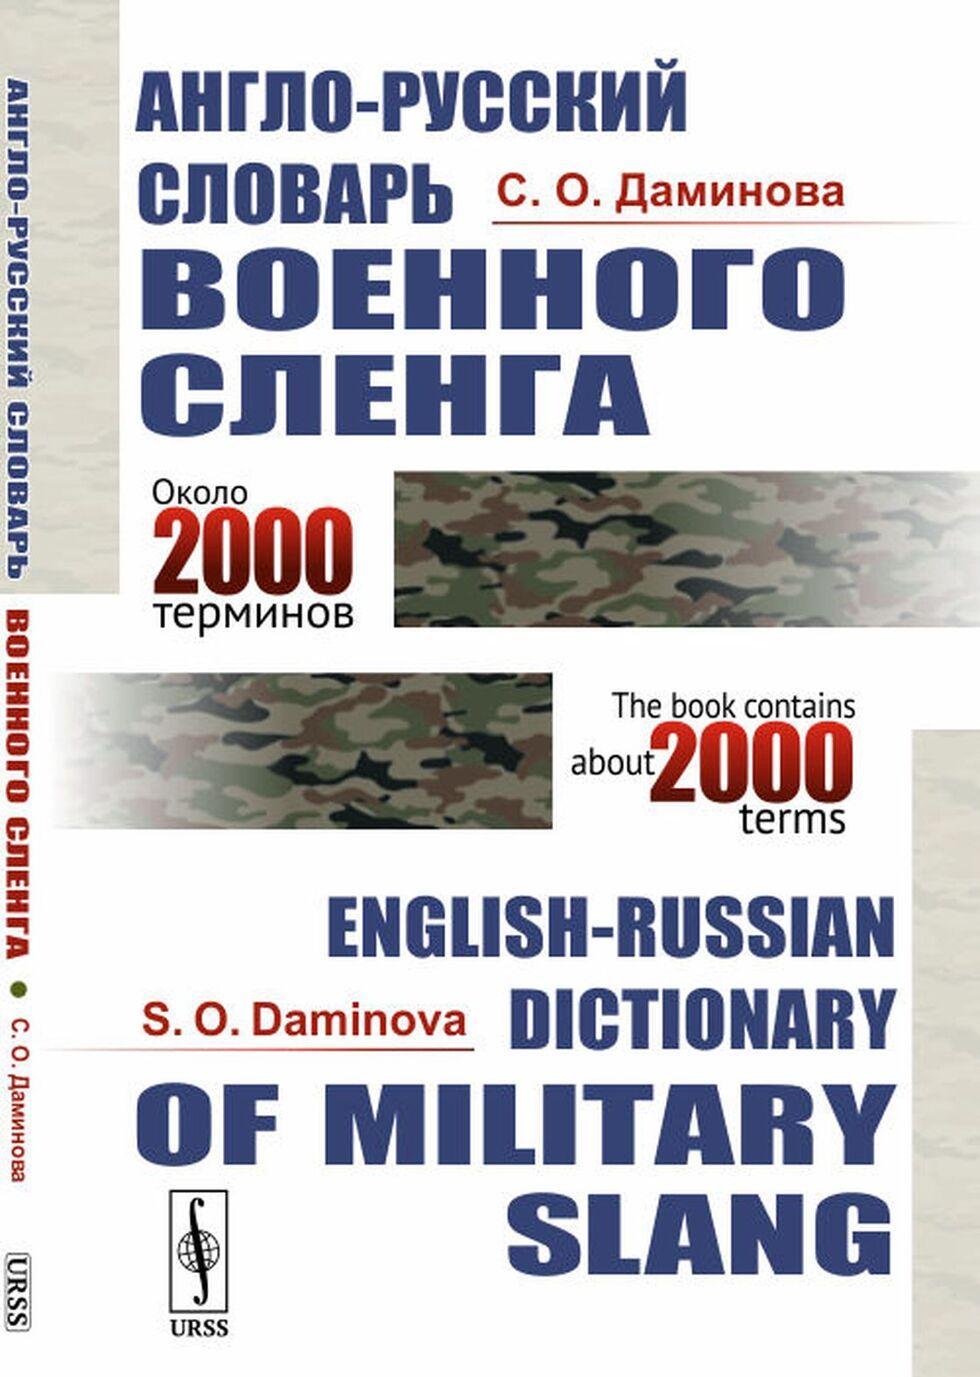 Anglo-russkij slovar voennogo slenga // English-Russian Dictionary of Military Slang